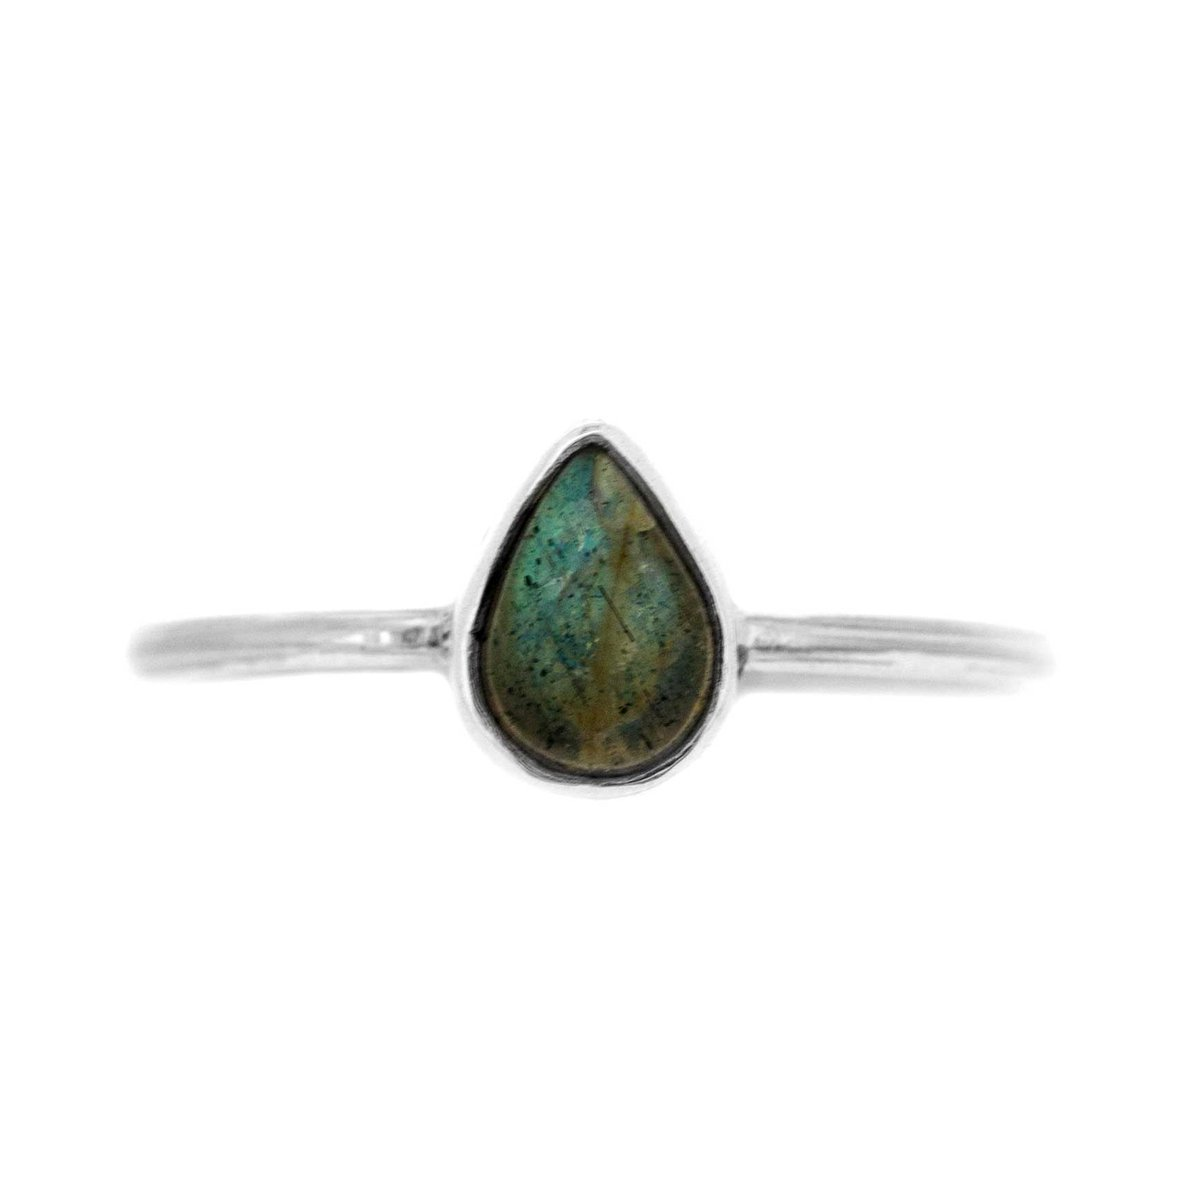 Our gorgeous, new little teardrop labradorite ring http://www.novasilver.co.uk/ . . . . #novasilver #silverring #labradorite #labradoritering #labradoritejewellery #newdesign #simple #elegant #welovewhatwedo #jewelleryisourpassion #jewellrydesigners #silverjewellery #jewelleryshoppic.twitter.com/ns6t7oJ5SR